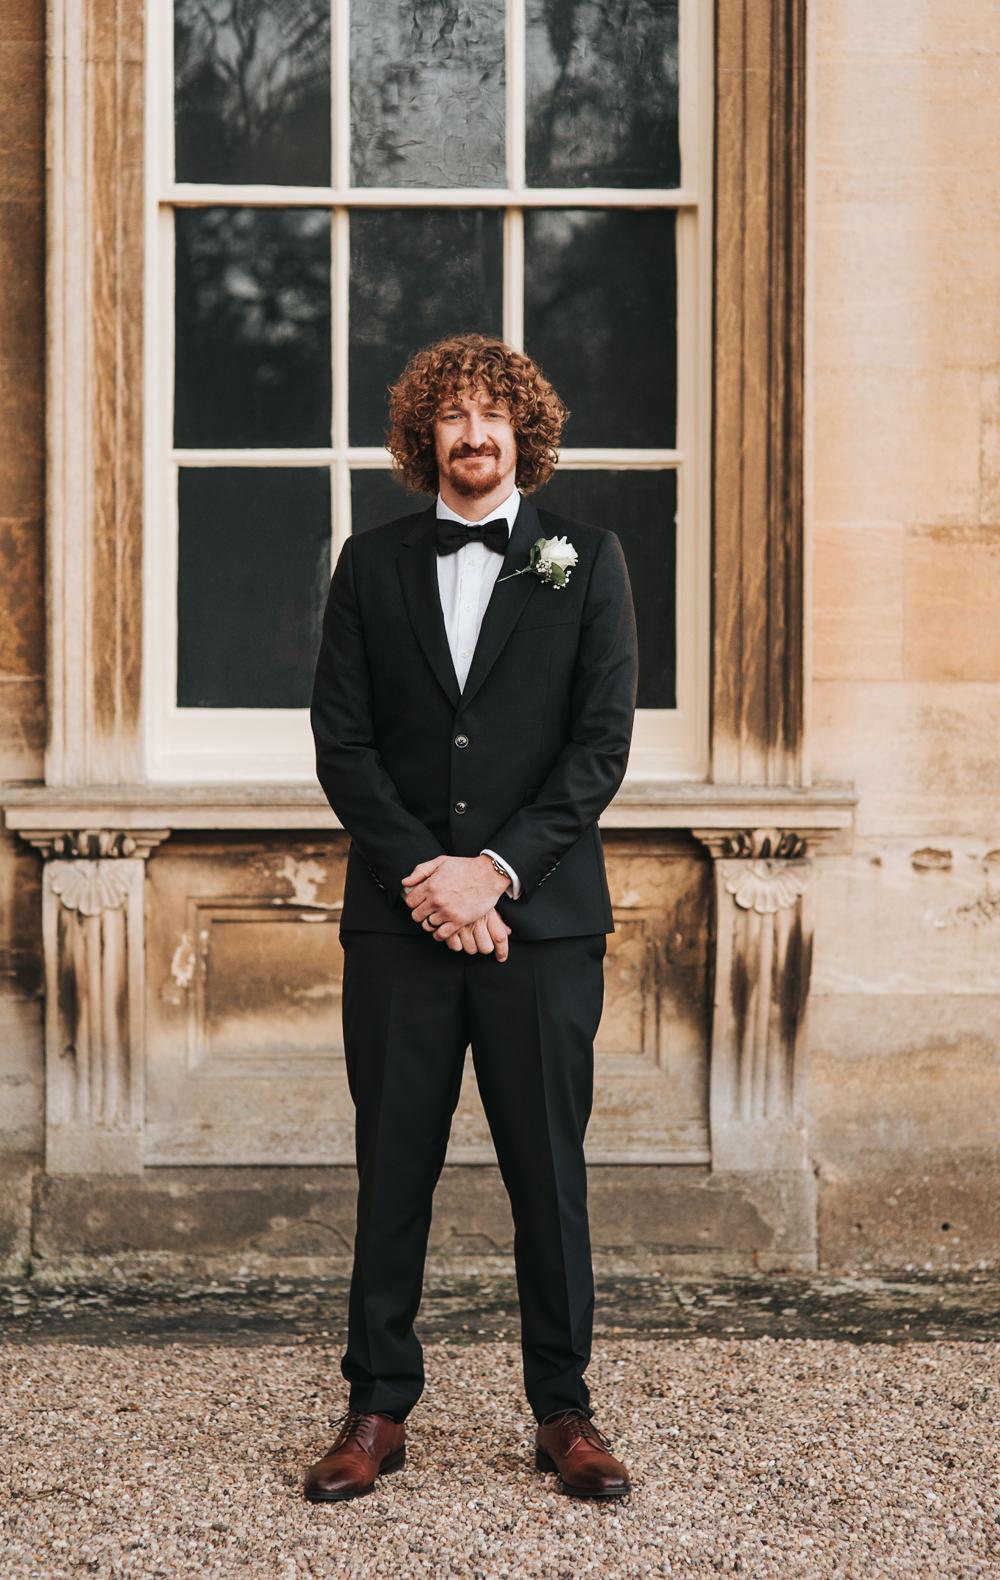 Groom Suit Black Bow Tie Prestwold Hall Wedding Pear & Bear Photography